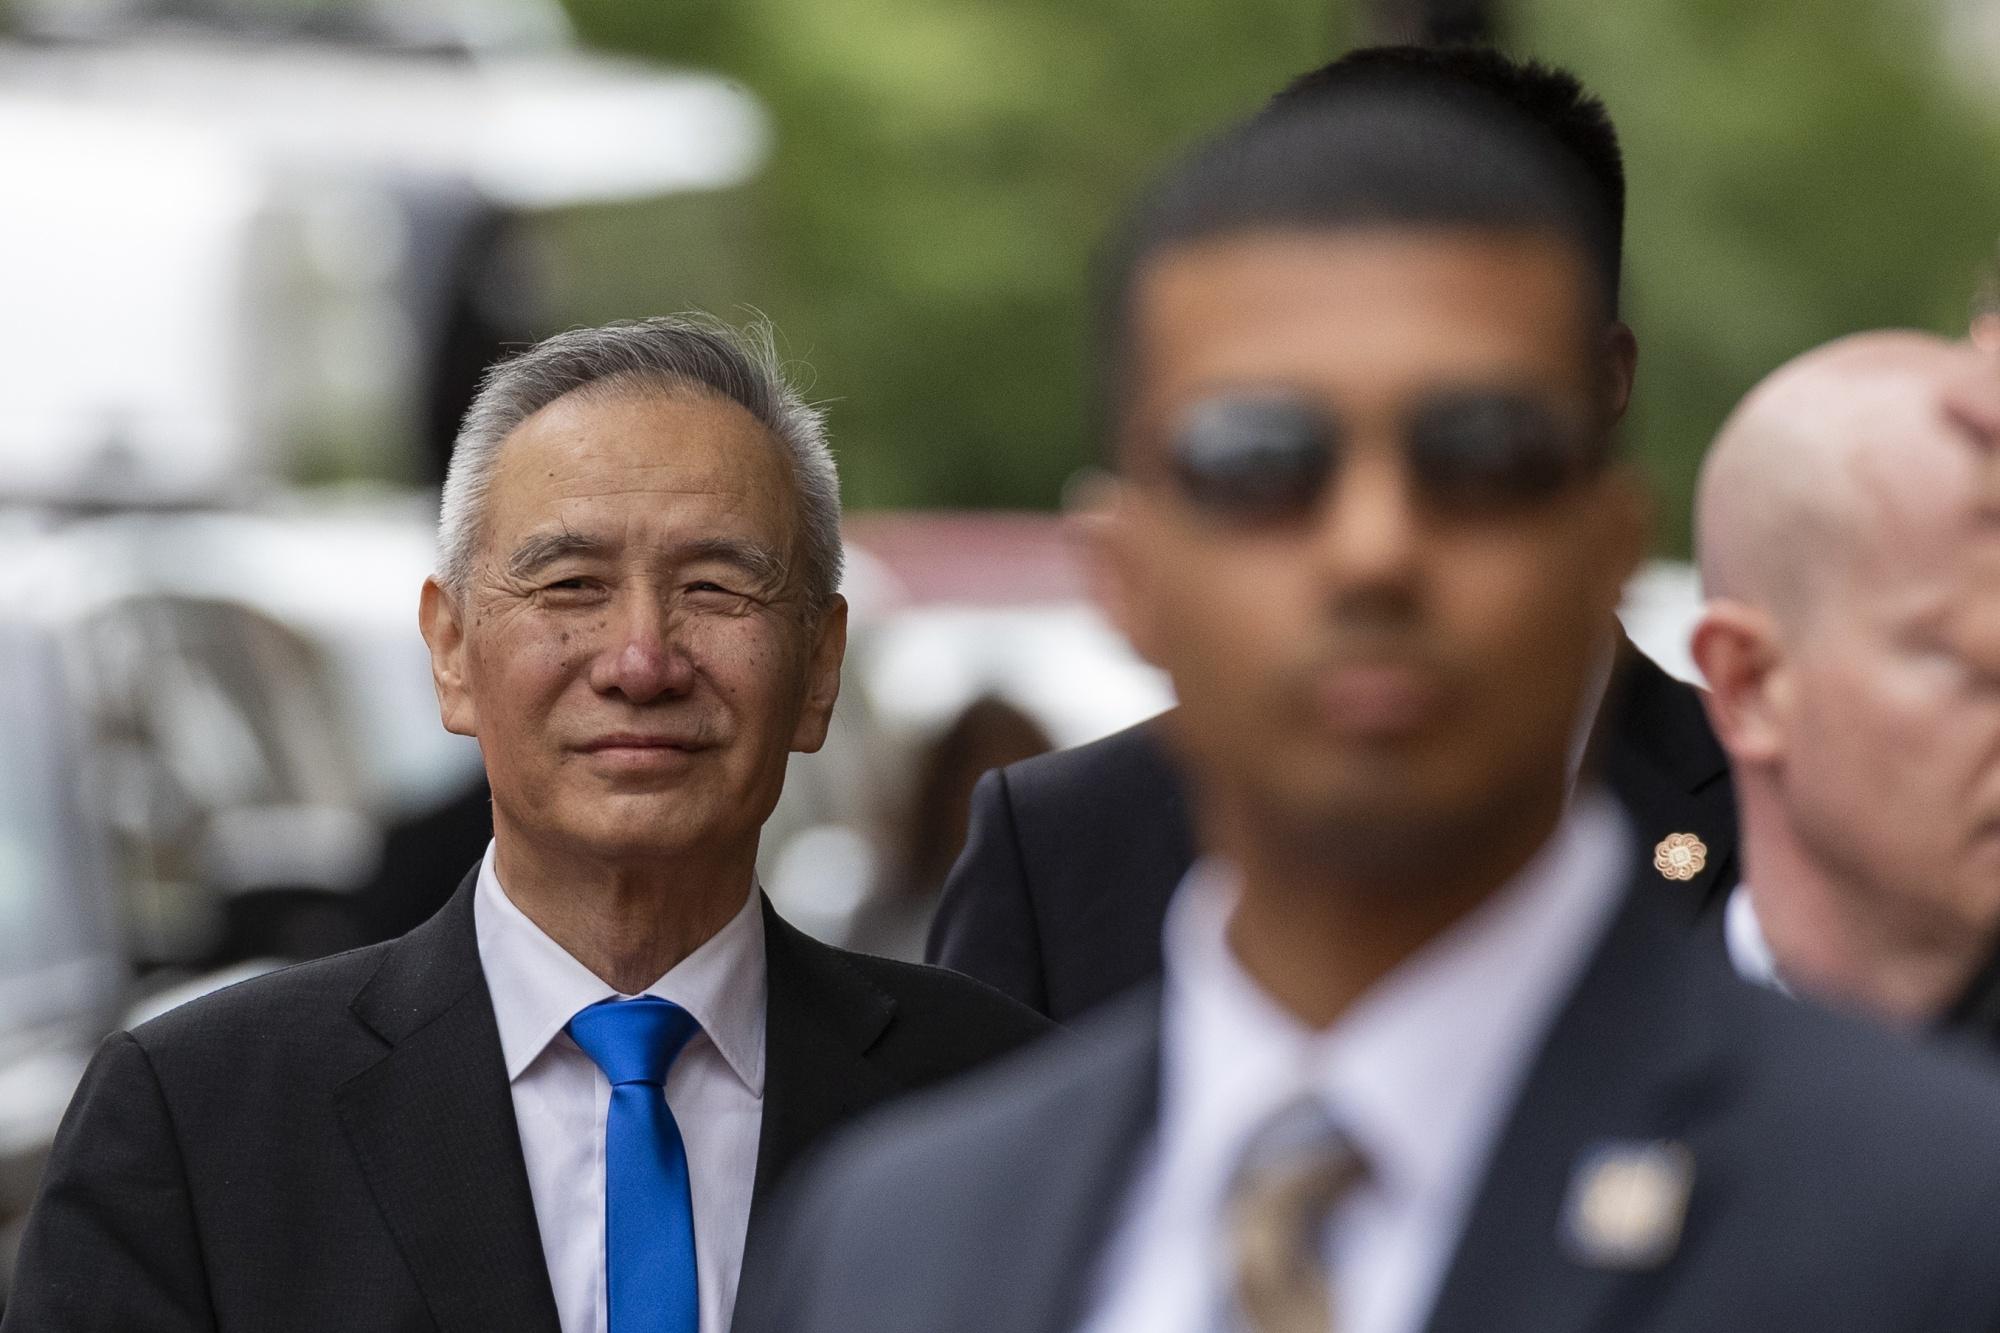 San sang tat tay, ong Trump se ap thue len toan bo hang nhap khau tu Trung Quoc?